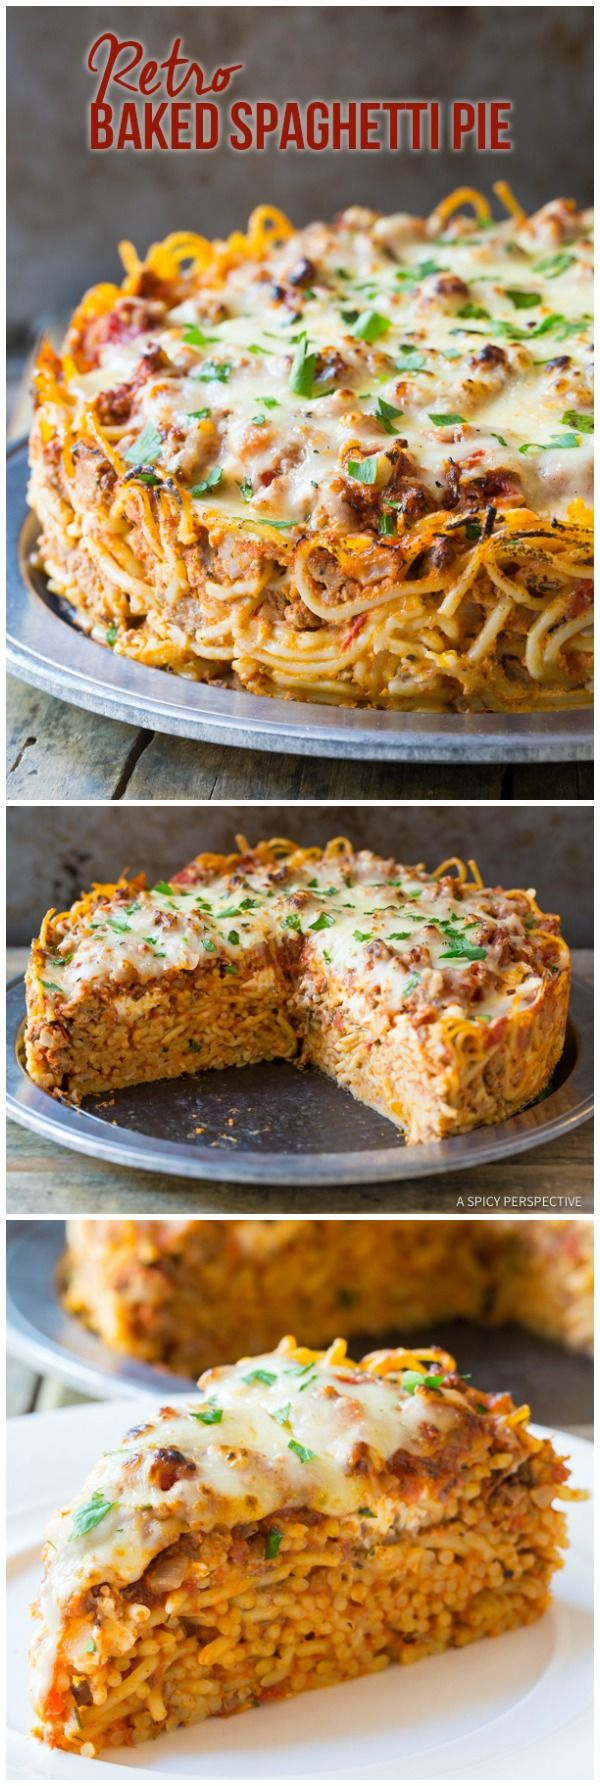 Retro Baked Spaghetti Pie Recipe | ASpicyPerspective.com #retro via @spicyperspectiv